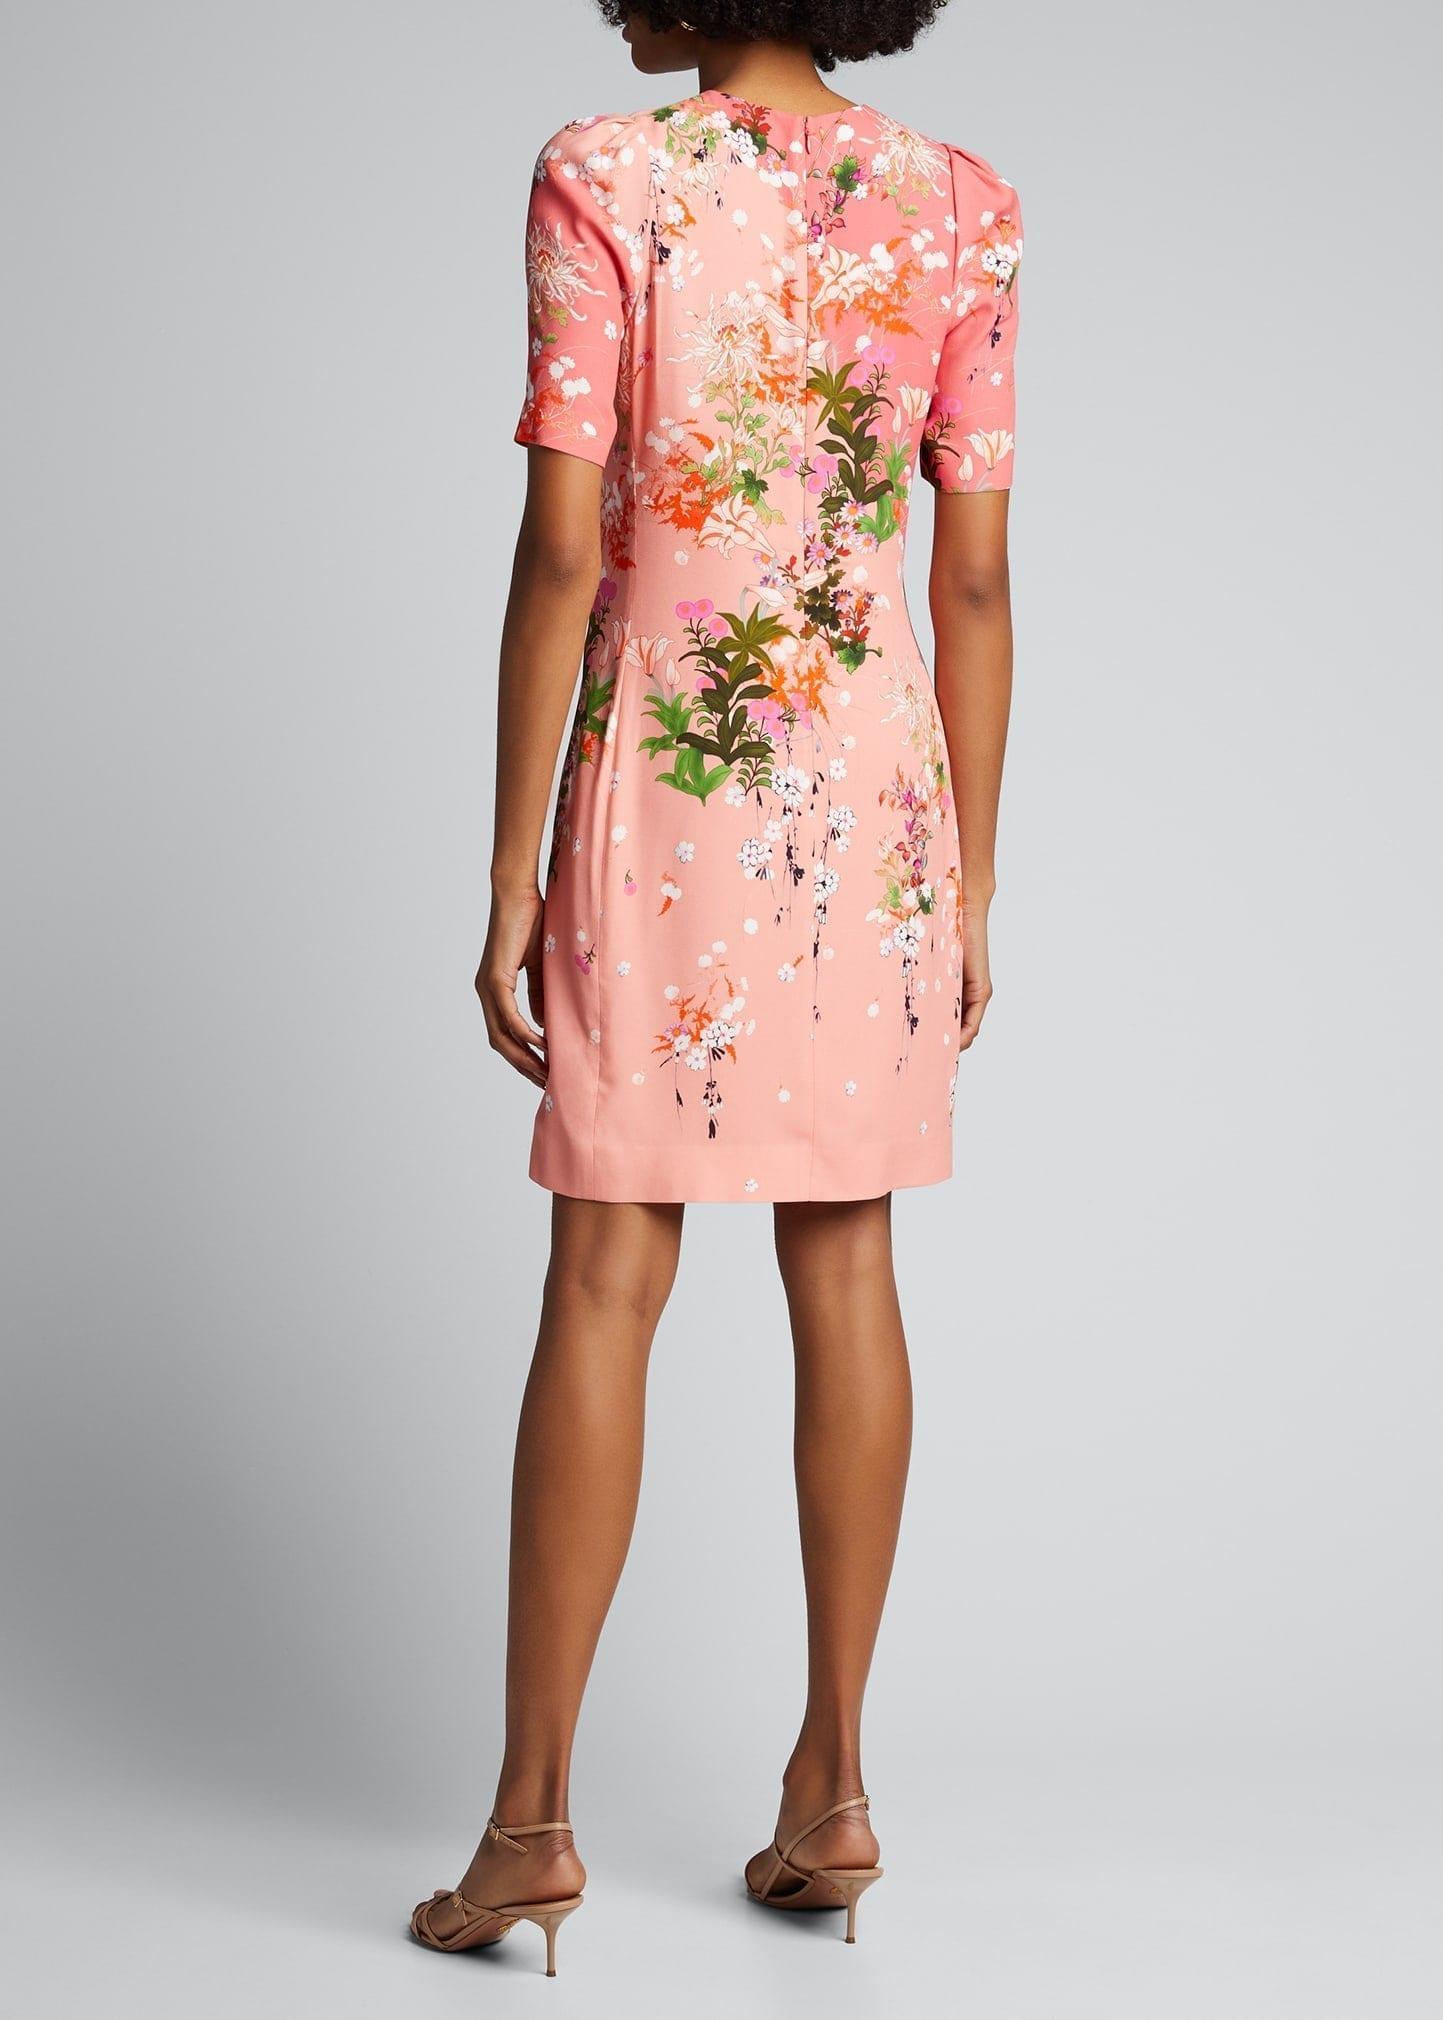 GIVENCHY Spring Aroma Printed Crepe Satin Sheath Dress